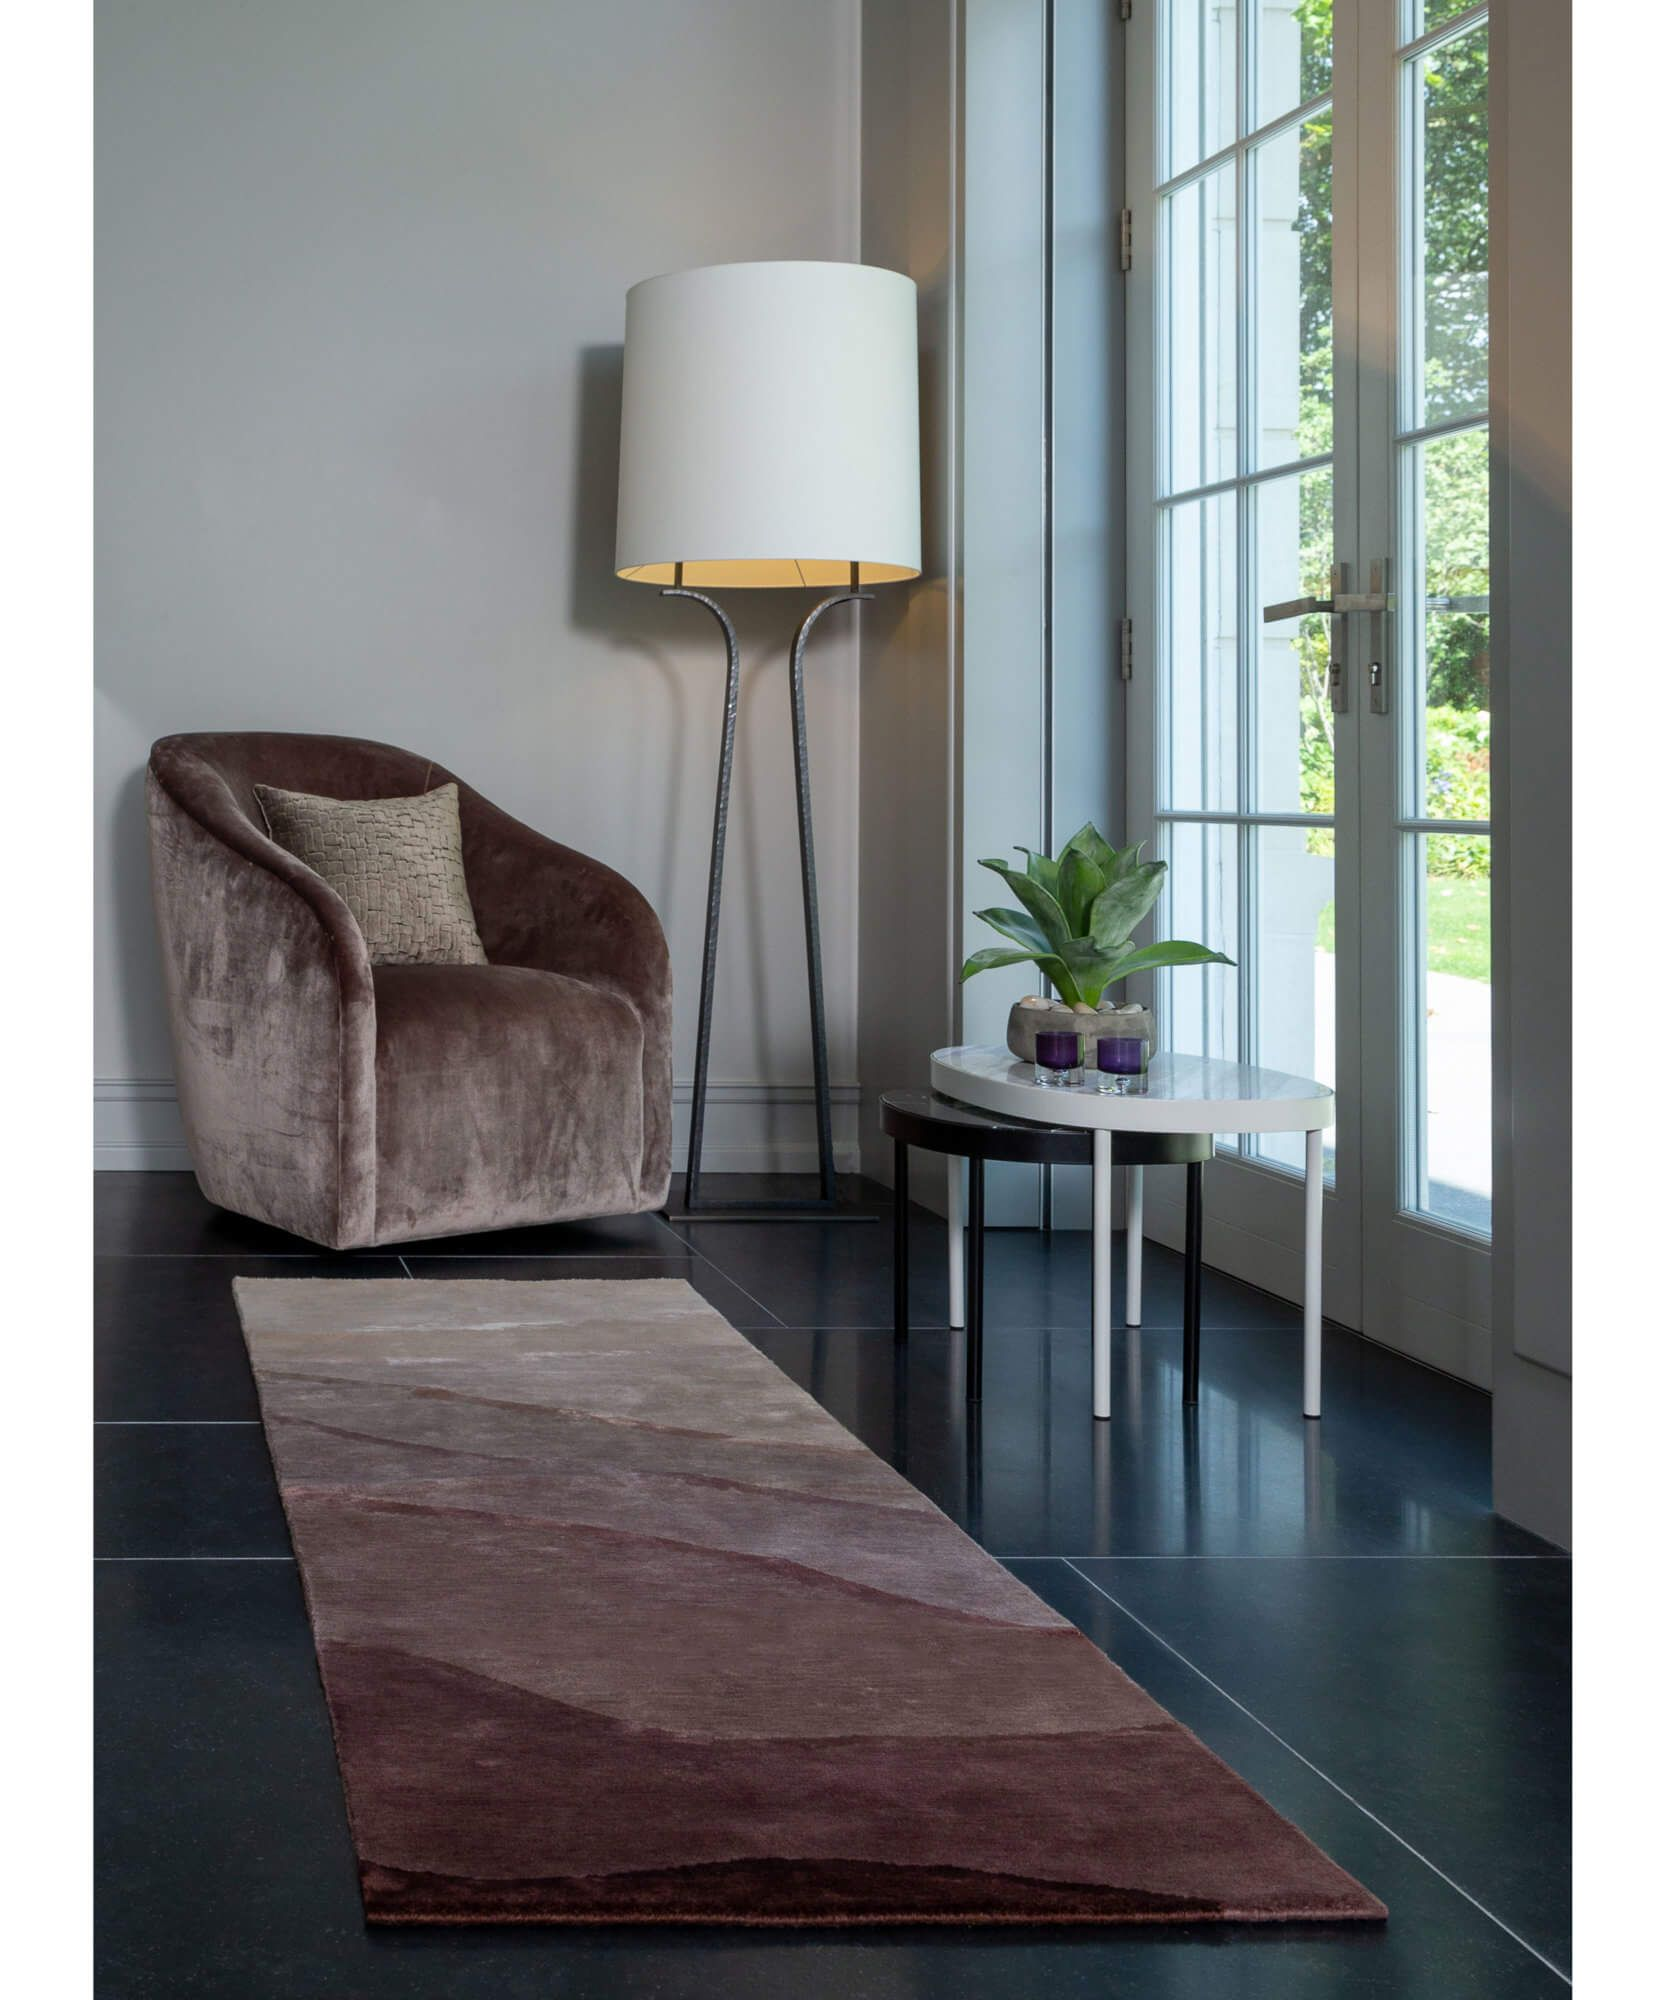 Landscape Carpet Runner (With images) Rugs uk, Brown